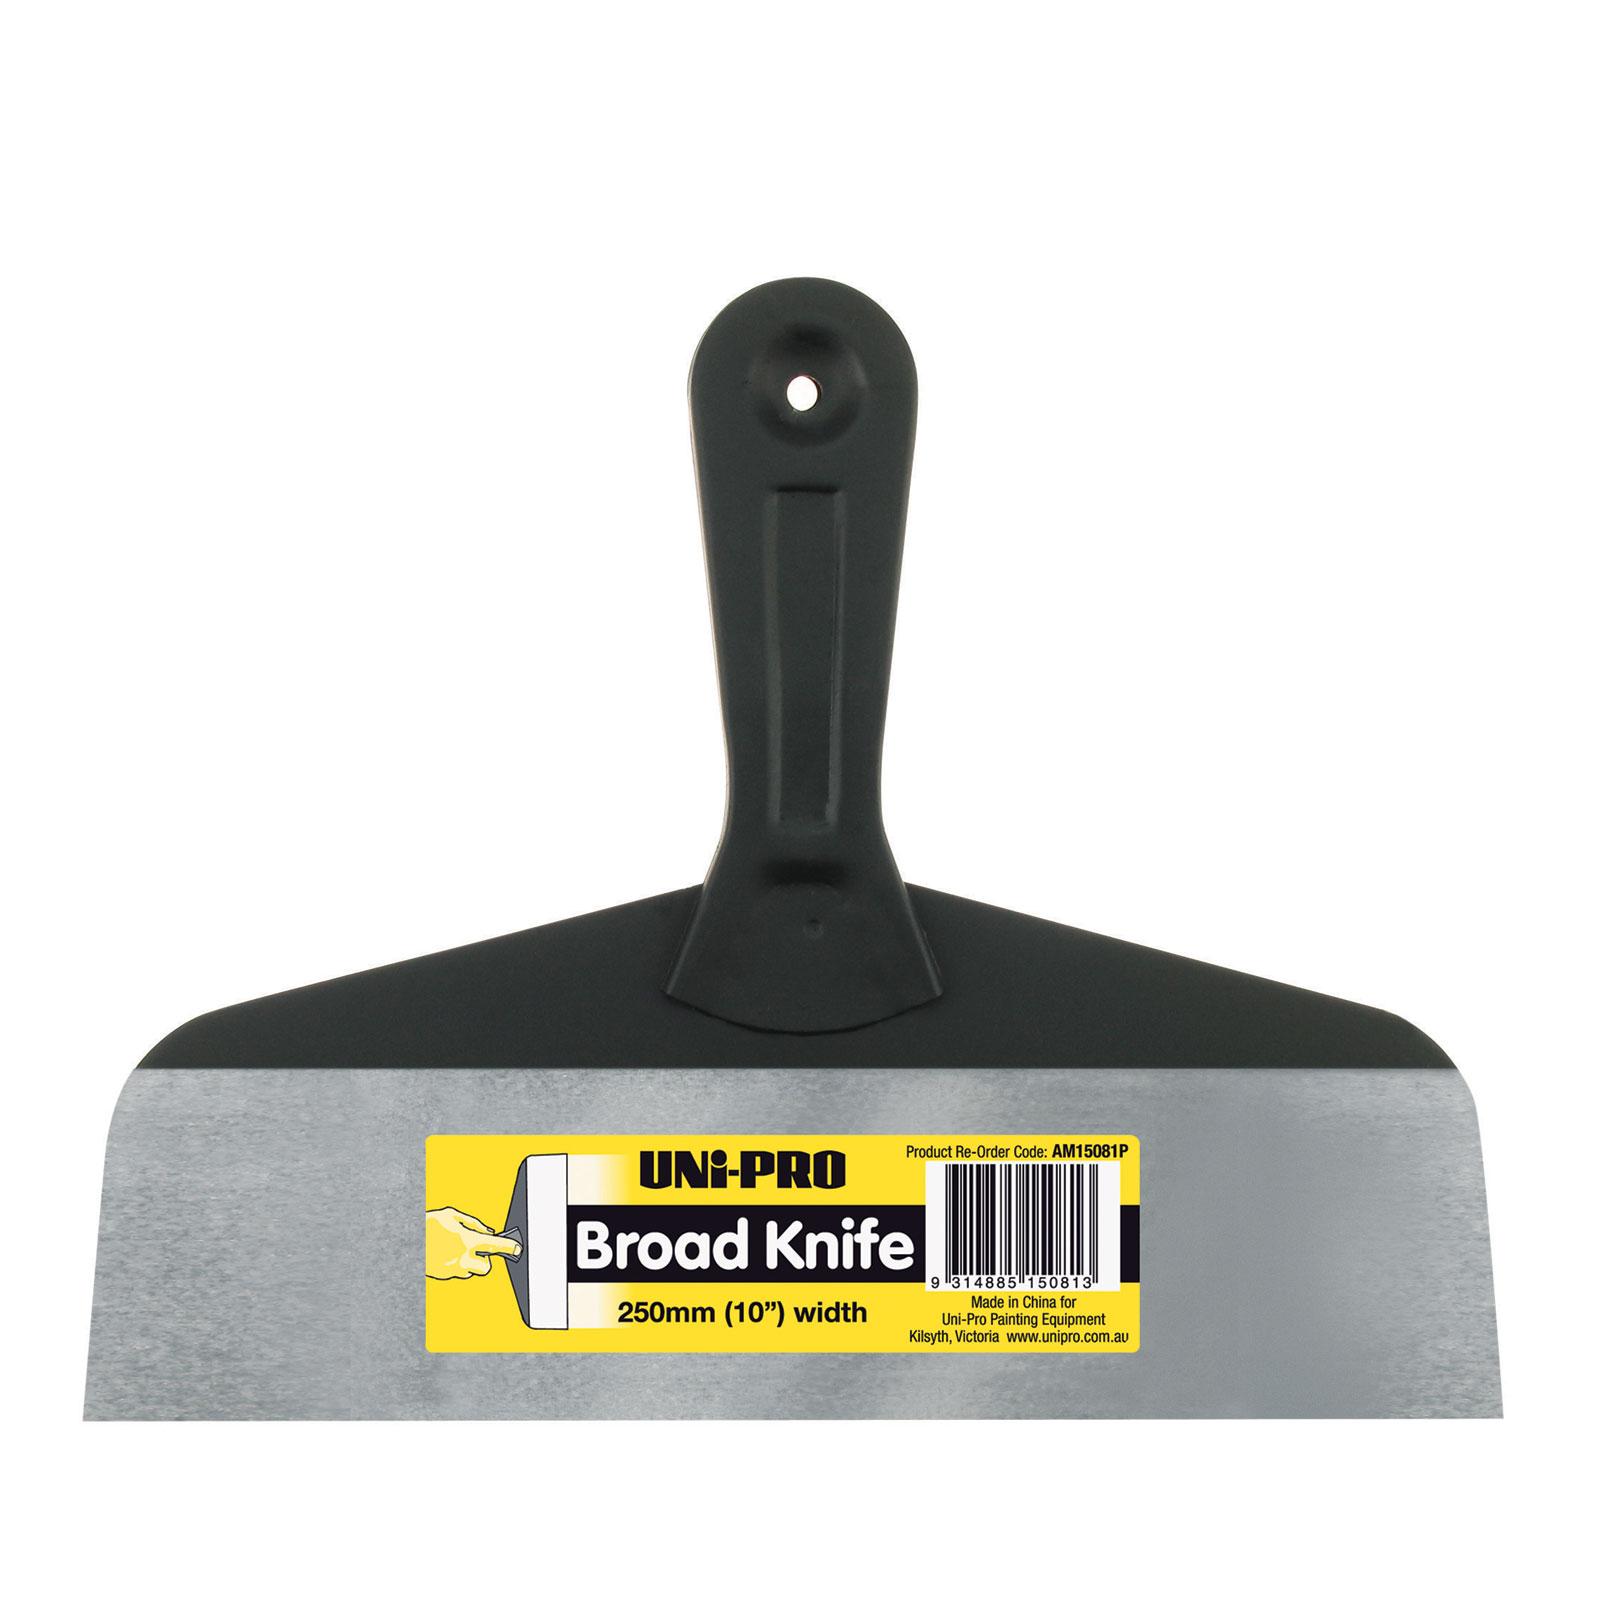 UNi-PRO Broad Knives